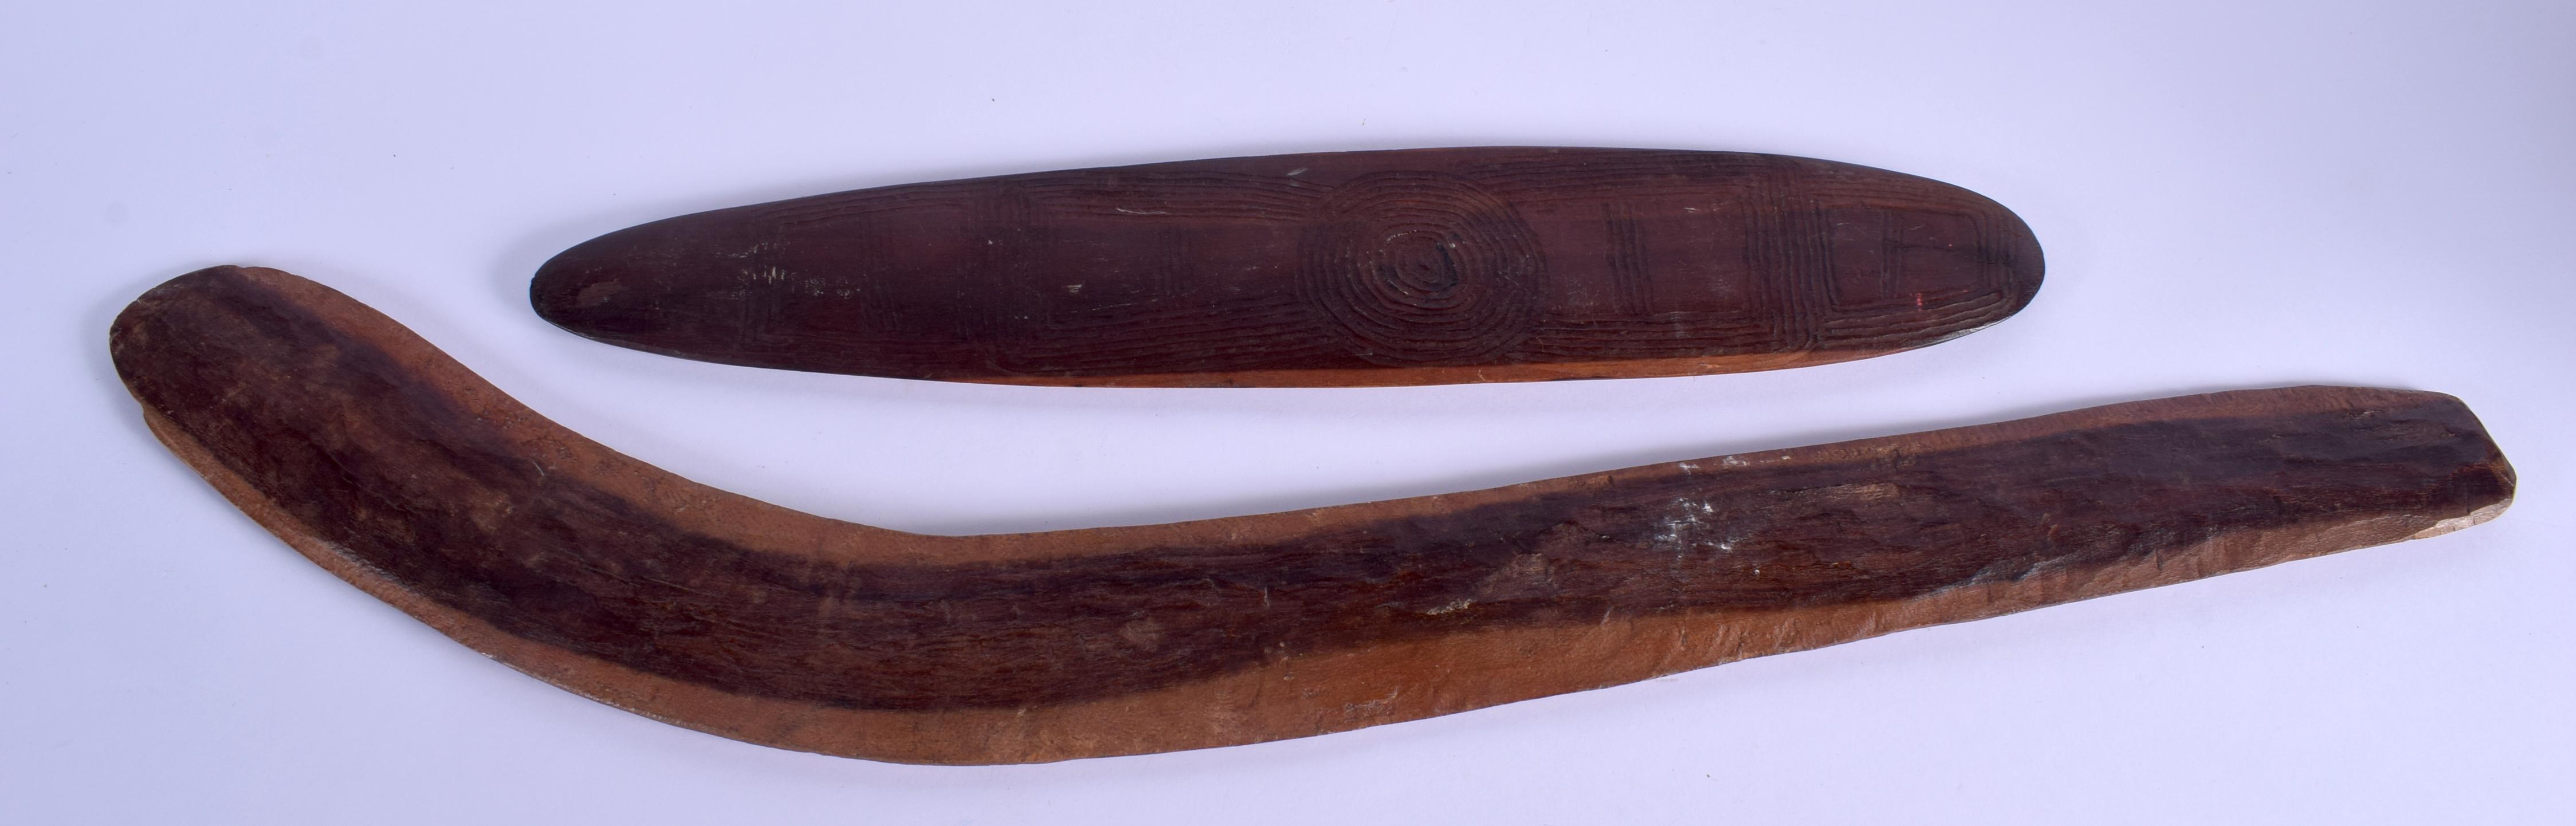 TWO TRIBAL ABORIGINAL BOOMERANGS. Largest 66 cm long. (2) - Image 2 of 2